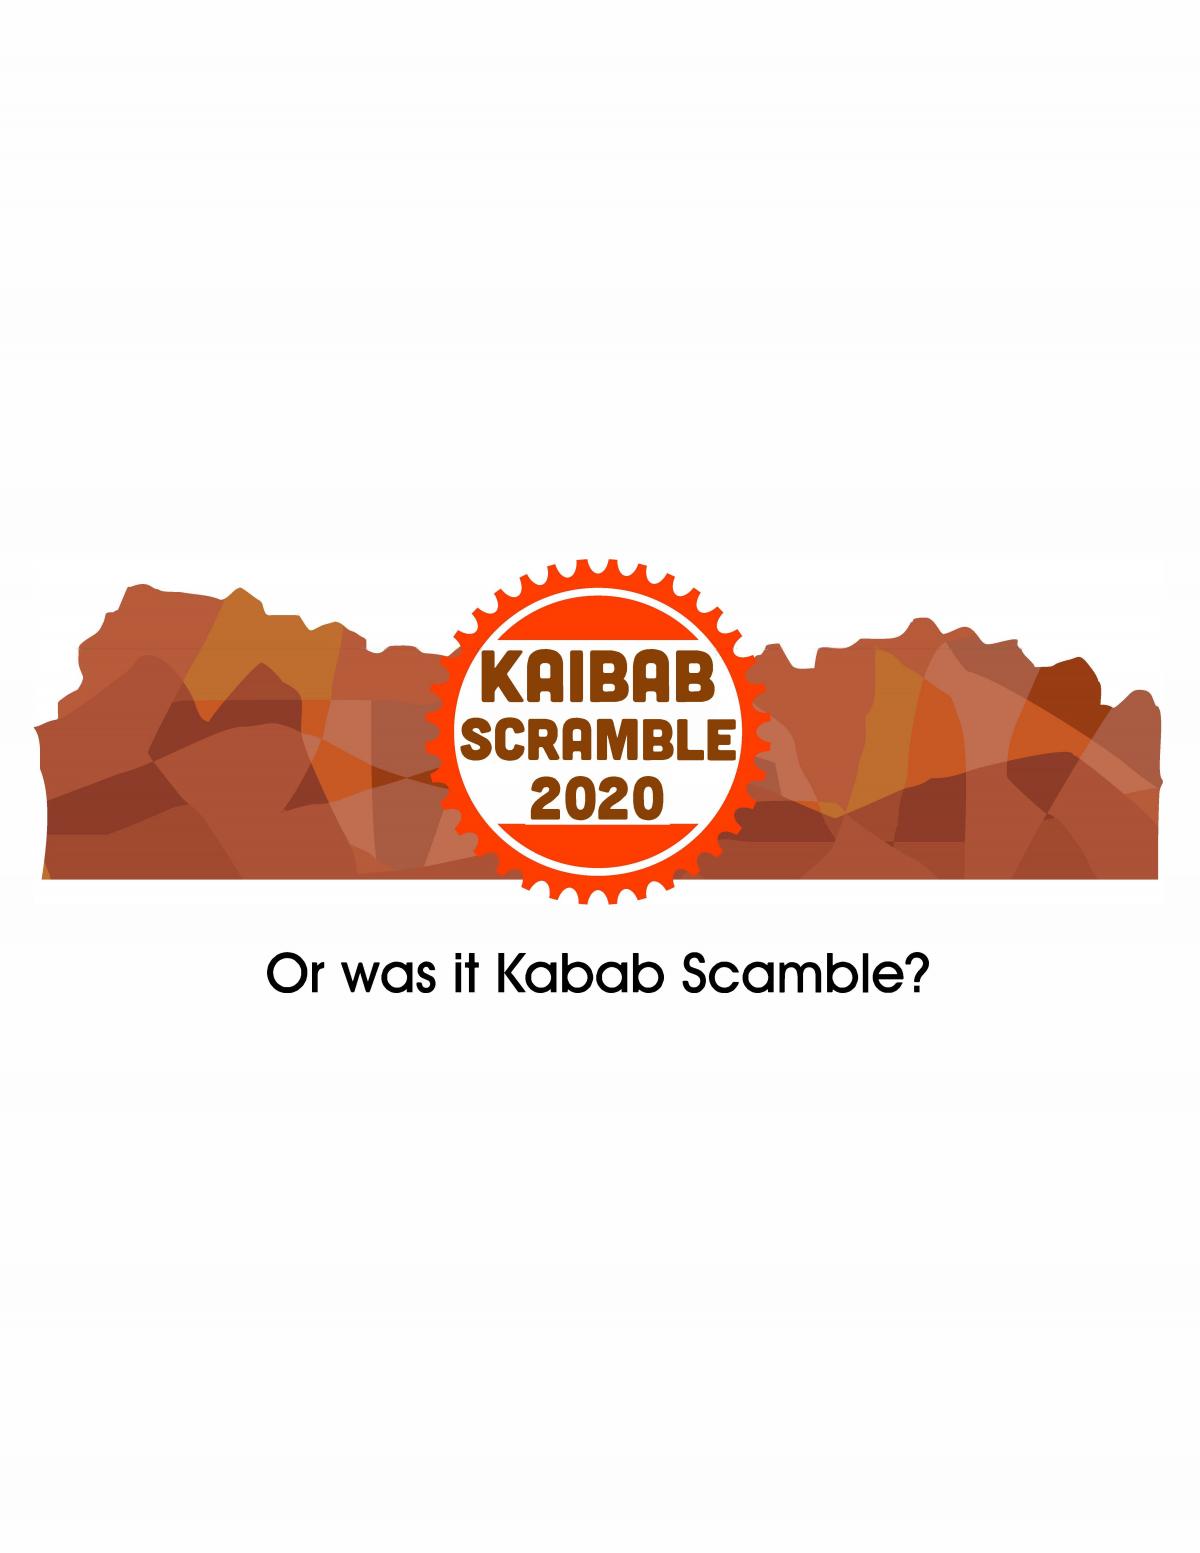 Kaibab Scramble